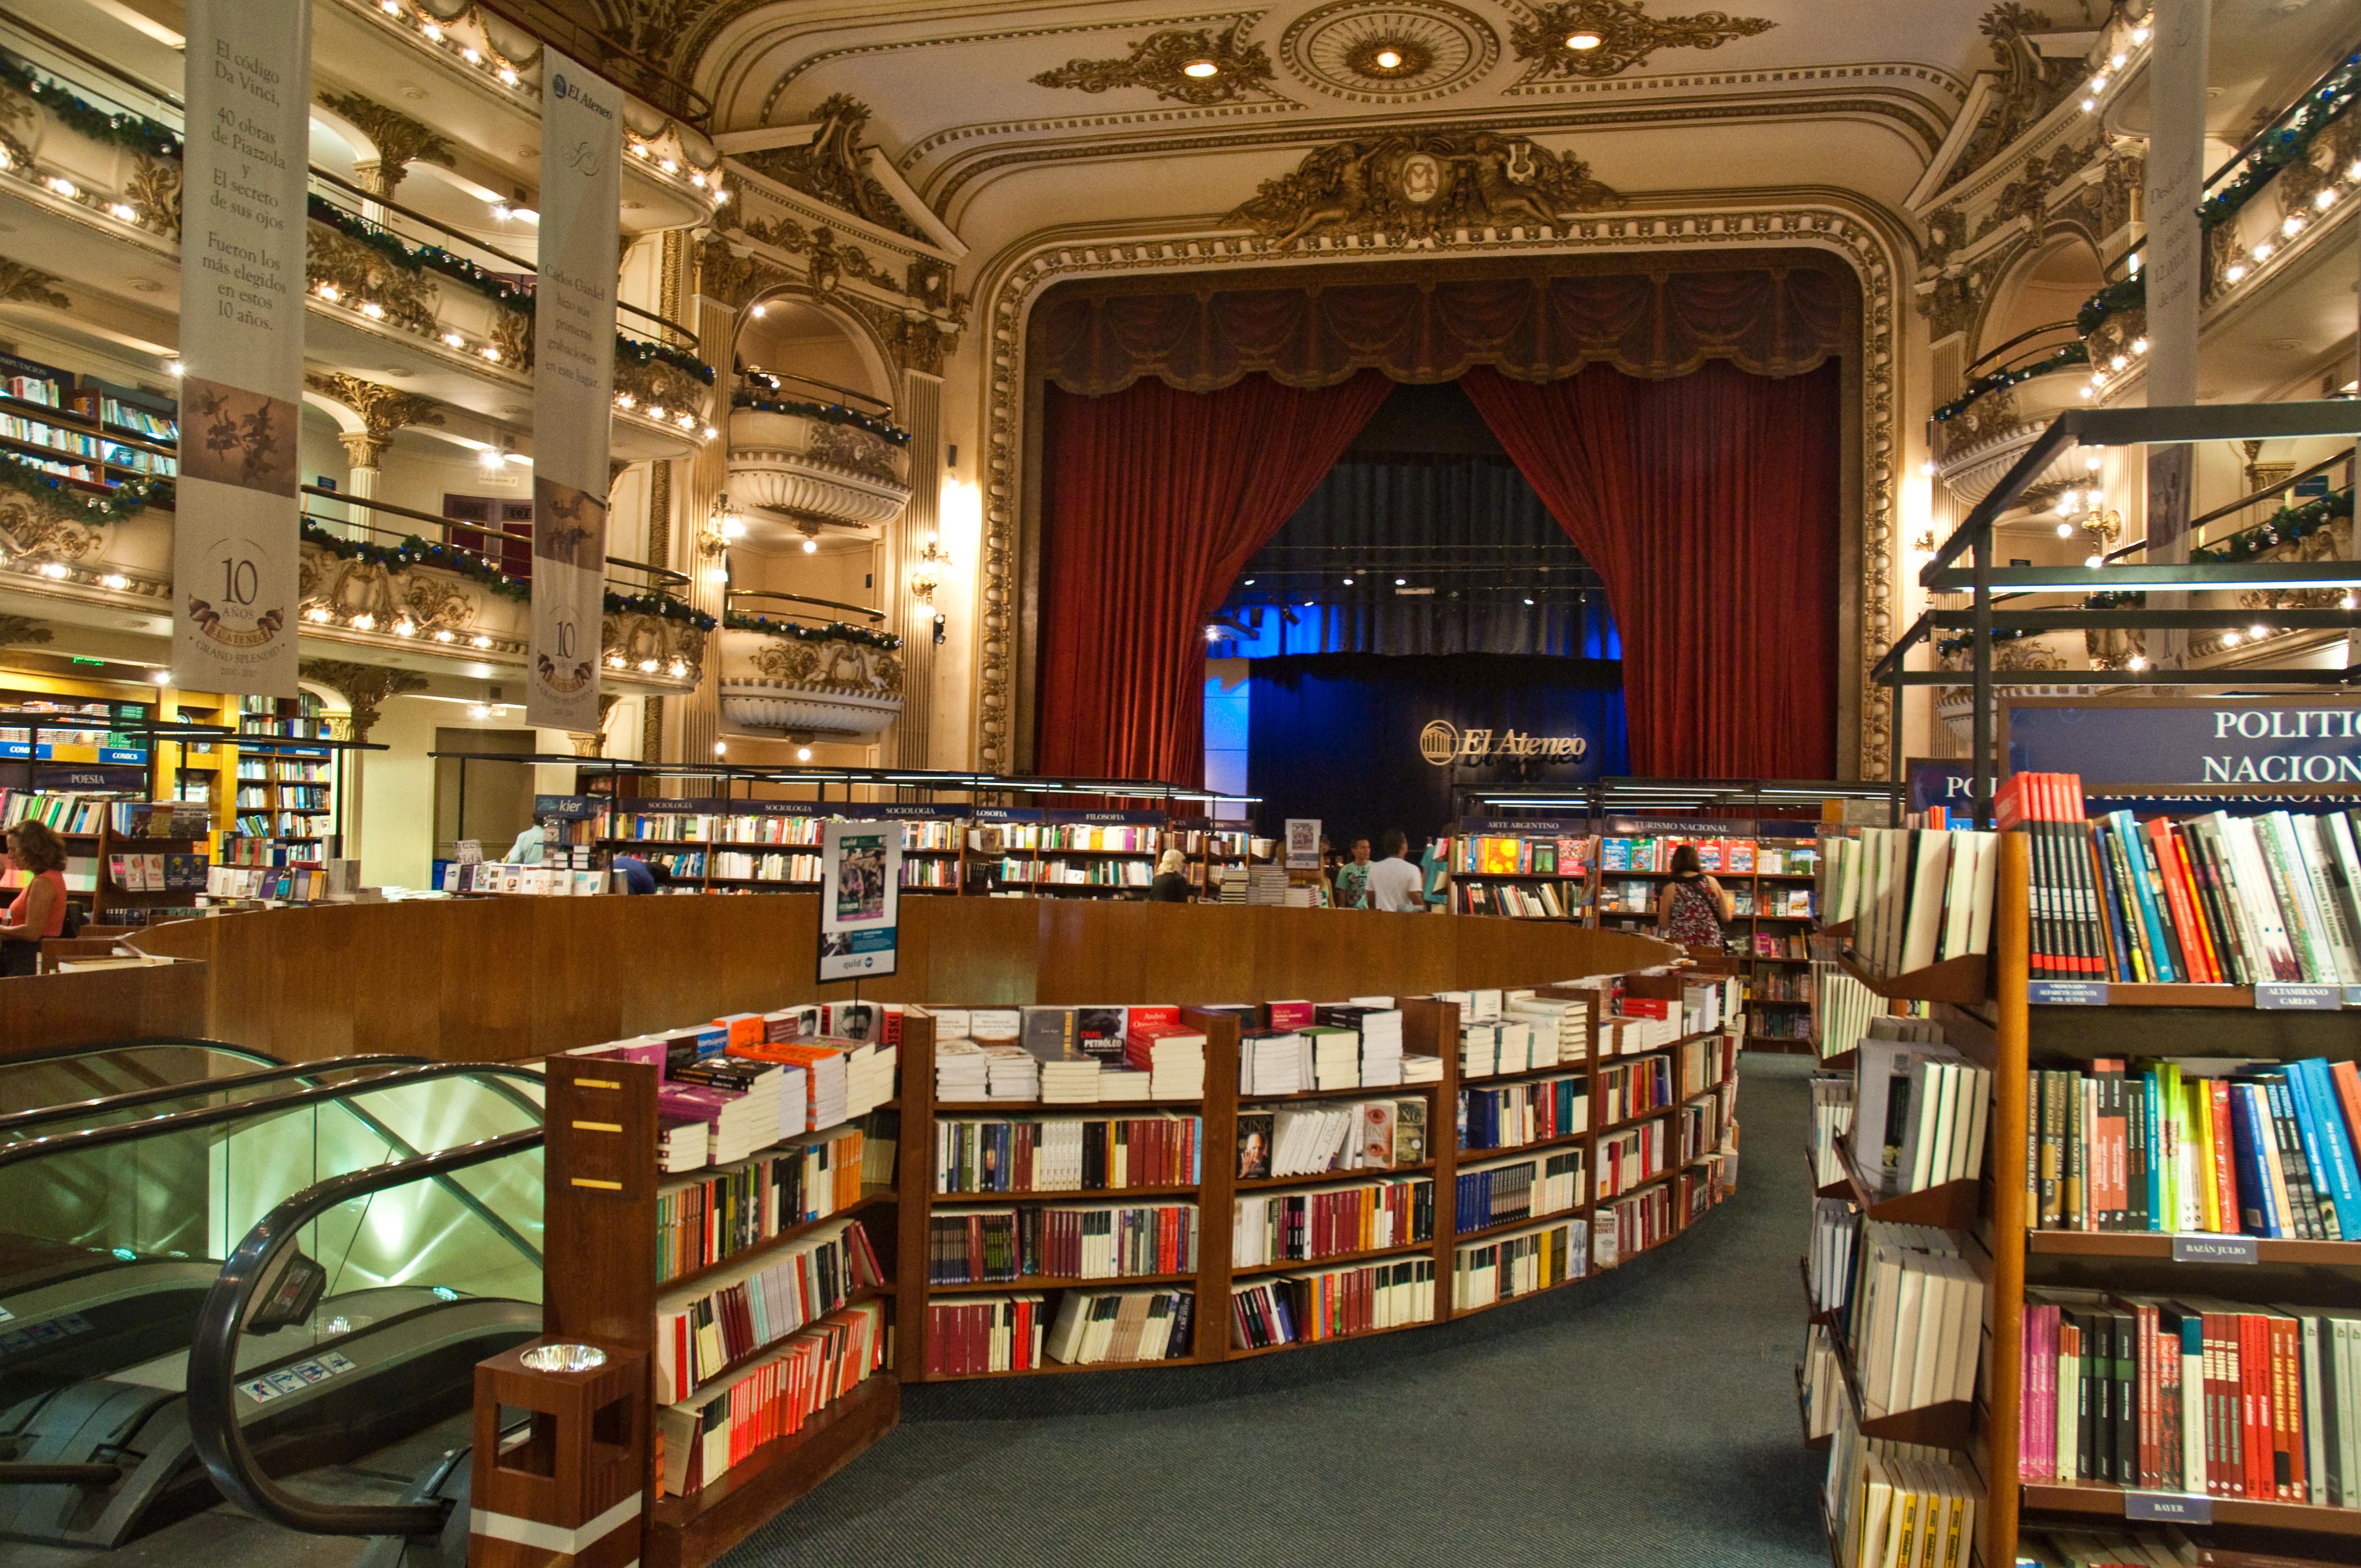 File:El Ateneo Grand Splendid Bookshop, Recoleta, Buenos Aires, Argentina,  28th. Dec. 2010 - Flickr - PhillipC.jpg - Wikimedia Commons